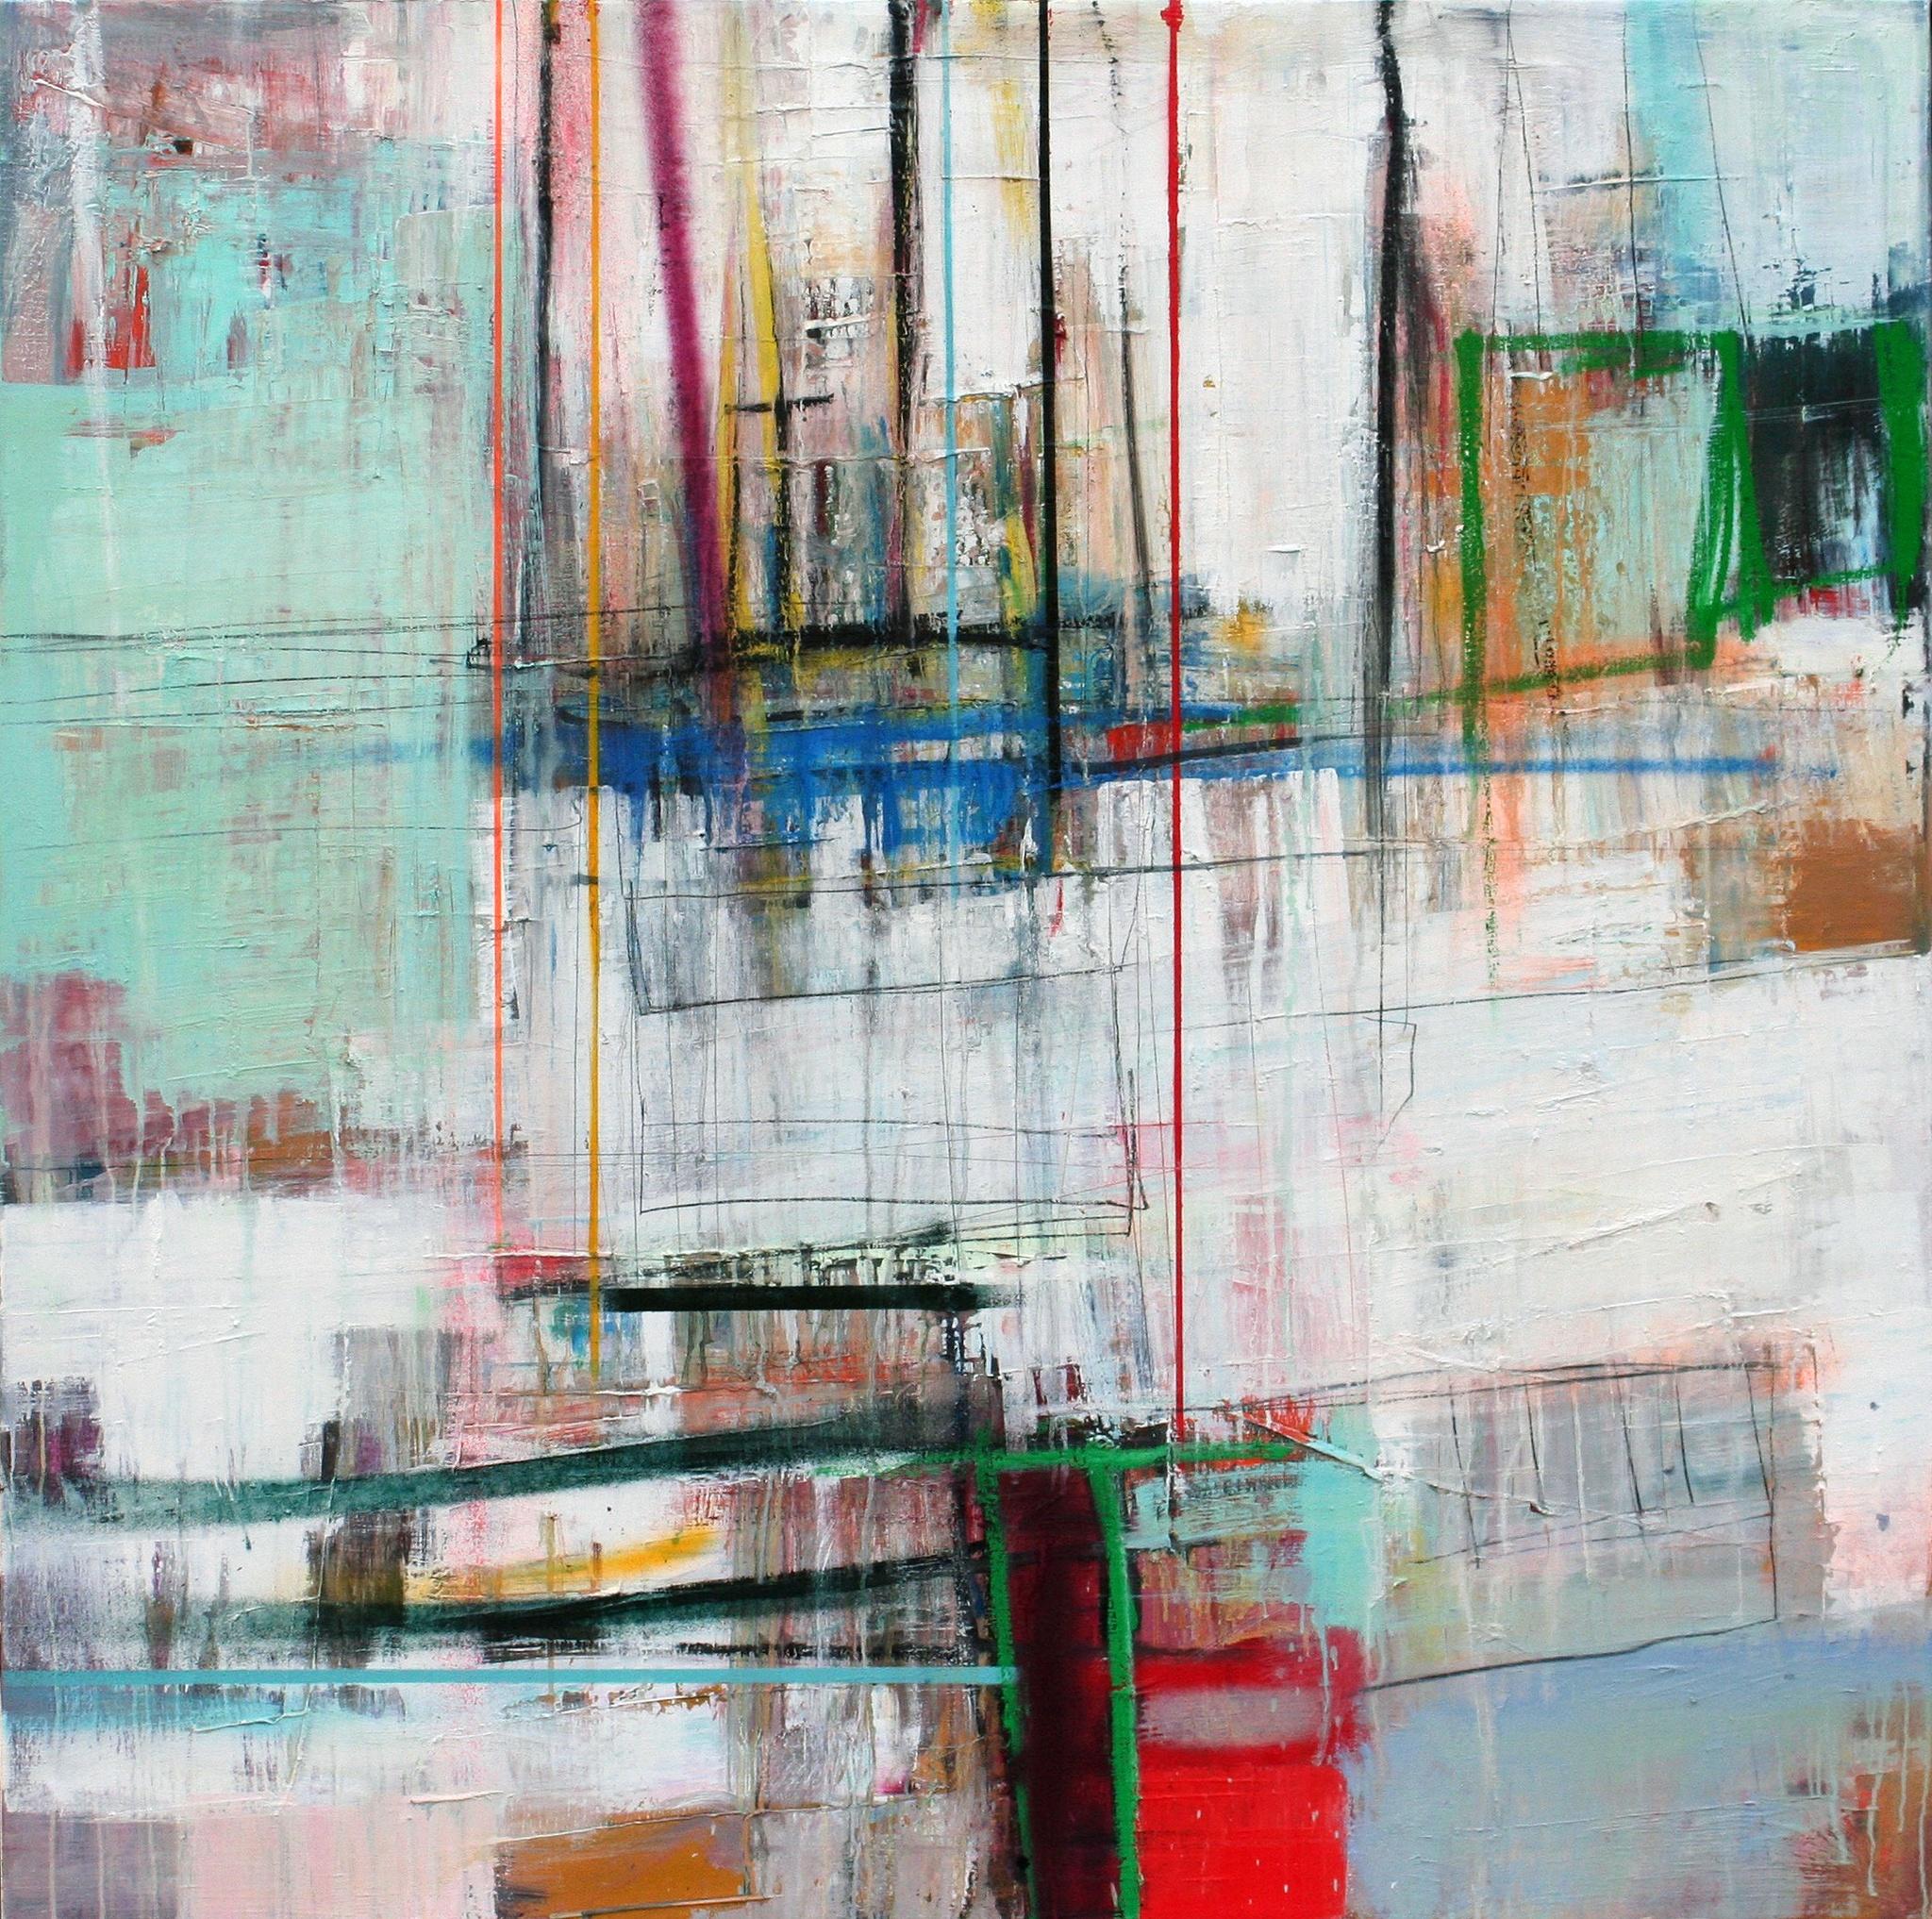 Digital Painting Digital Art Exhibition